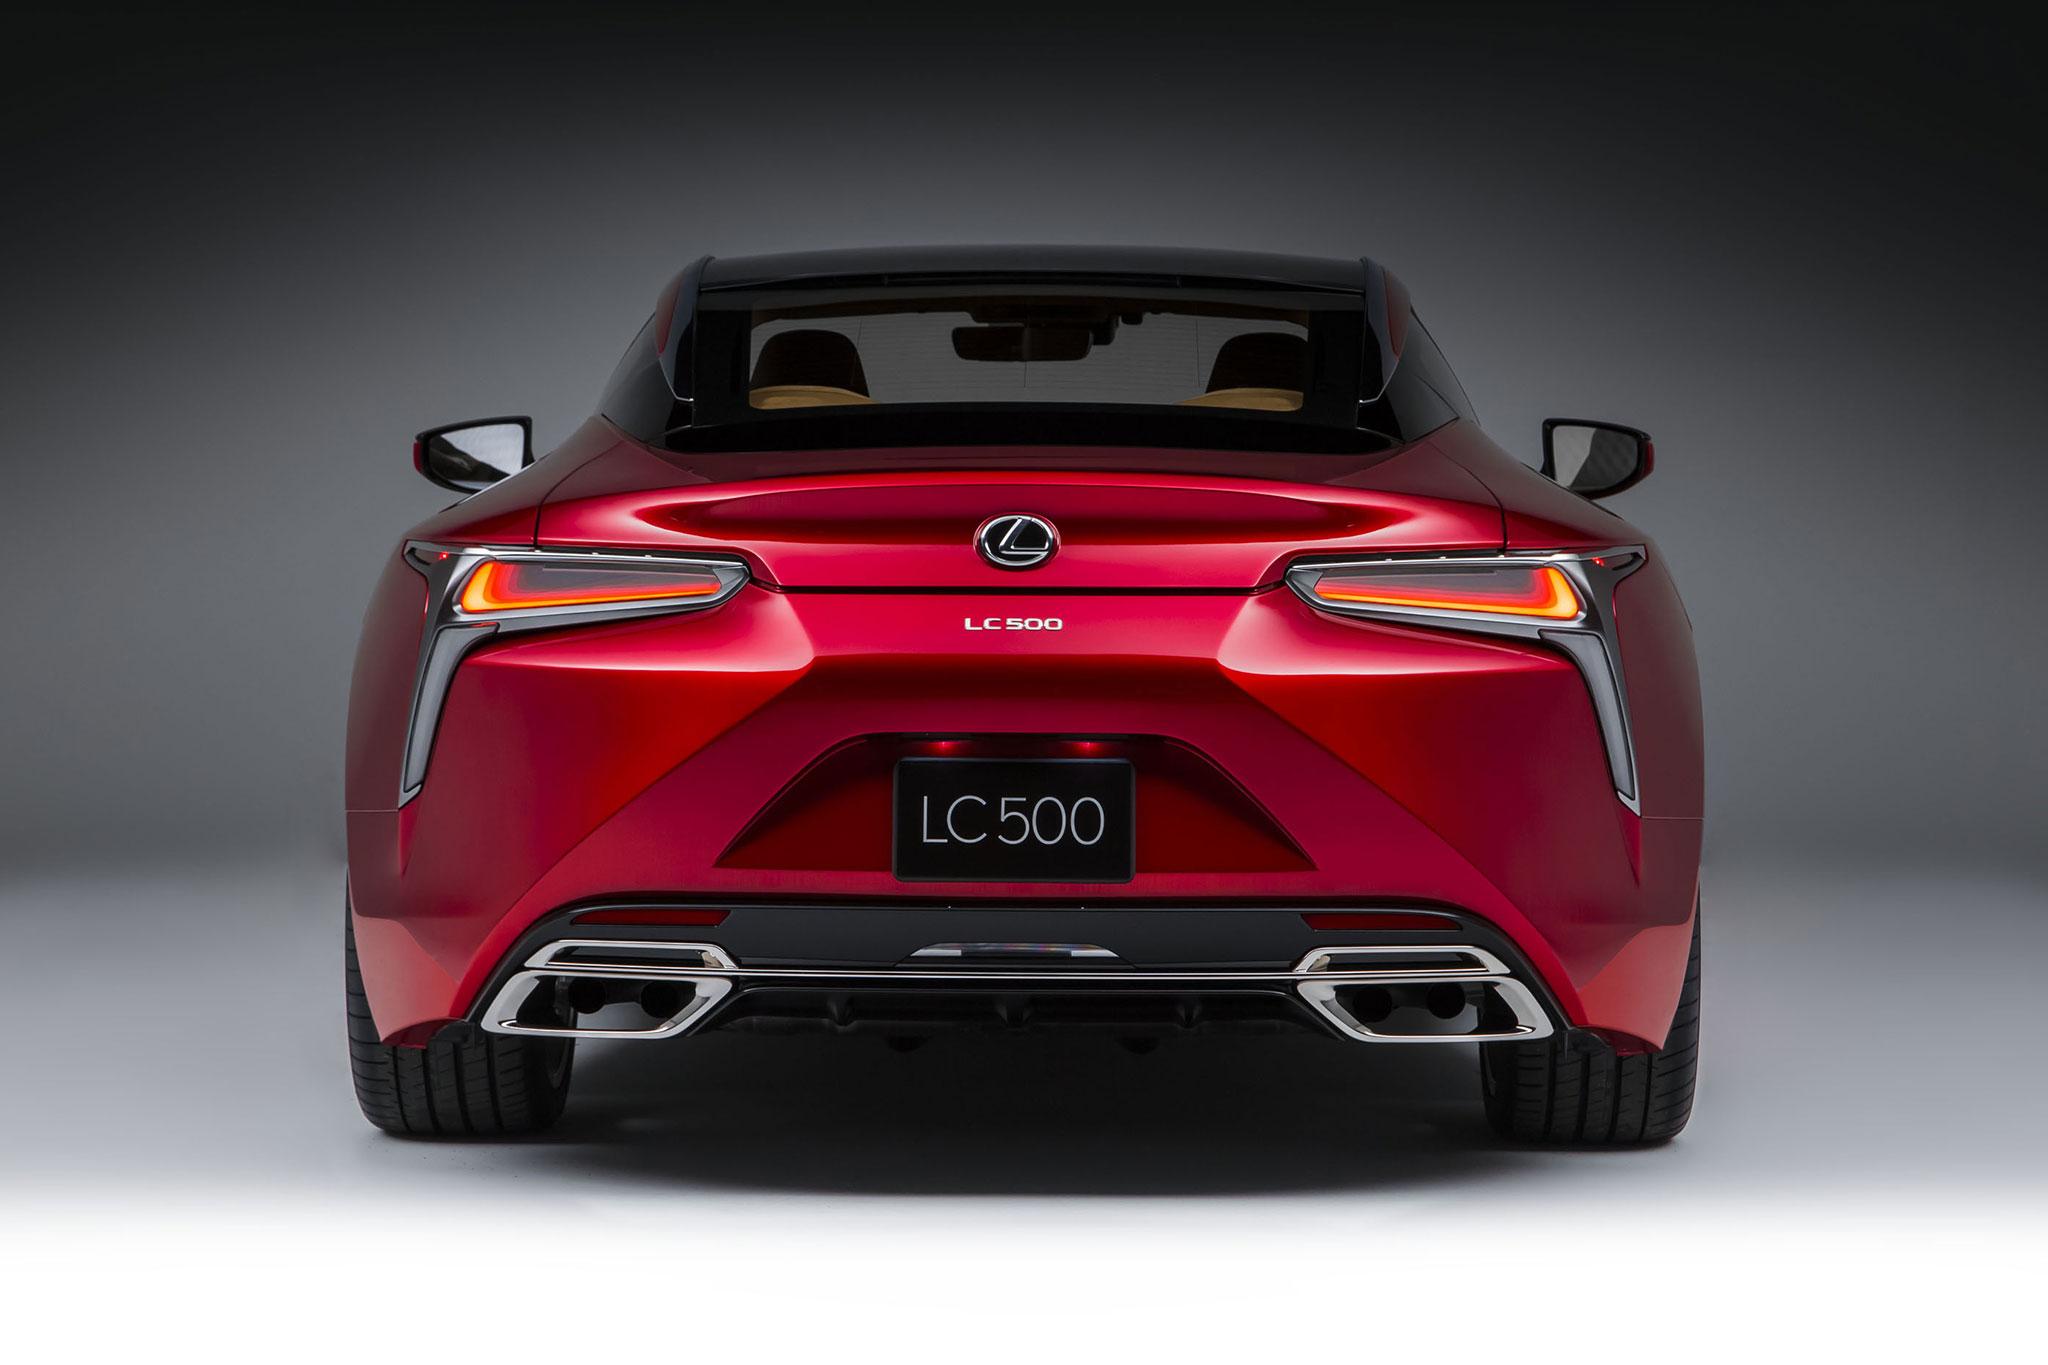 http://st.automobilemag.com/uploads/sites/11/2016/01/2018-Lexus-LC-500-rear-end3.jpg